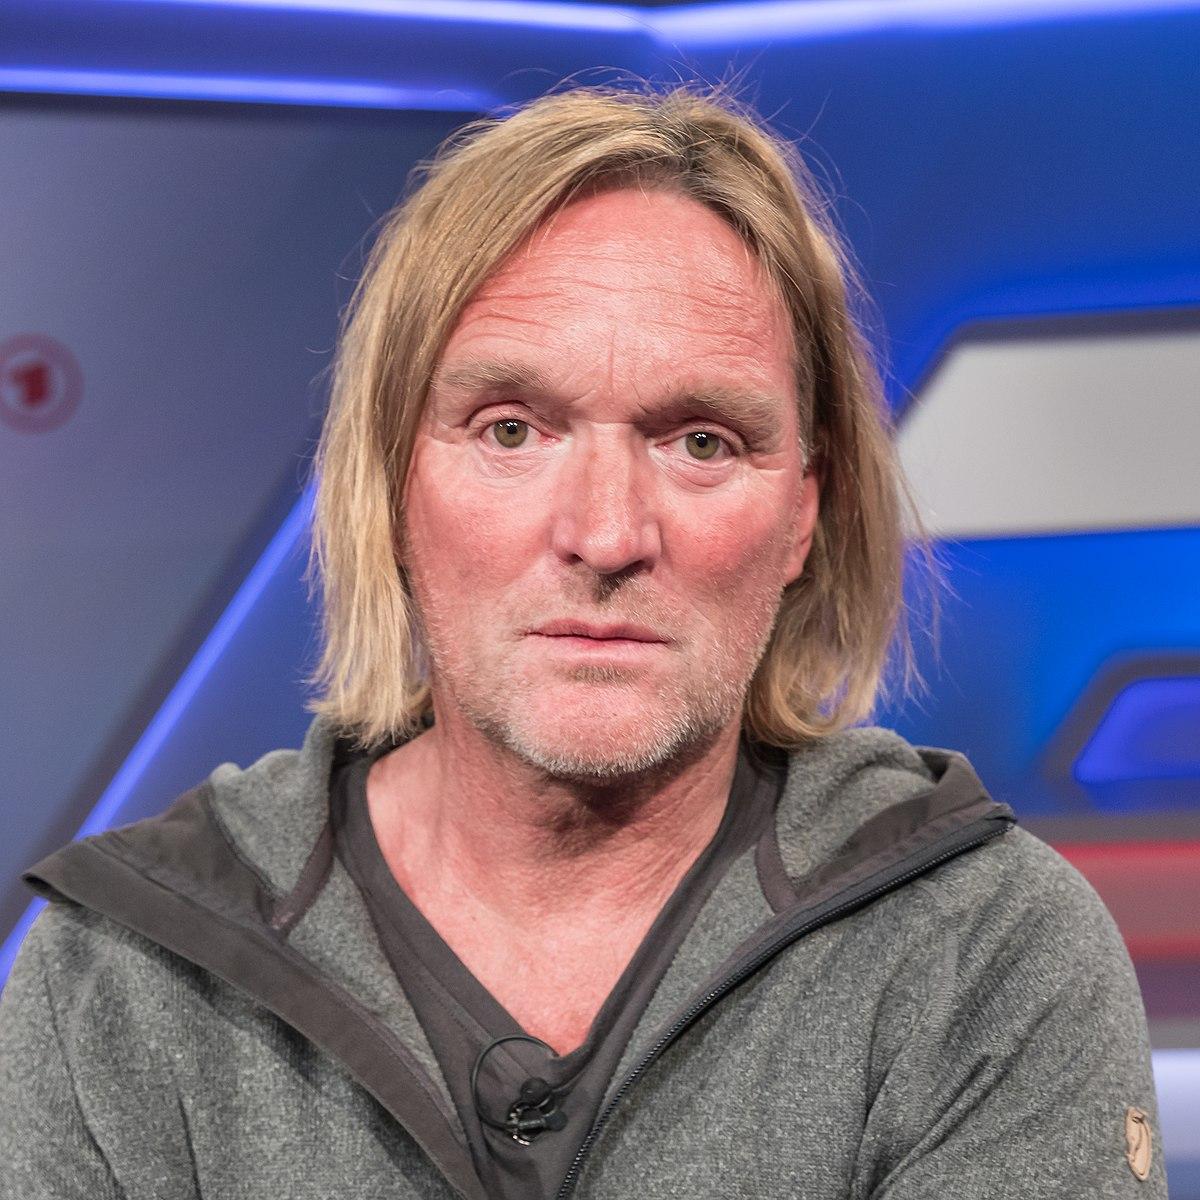 Andreas Kieling Tot